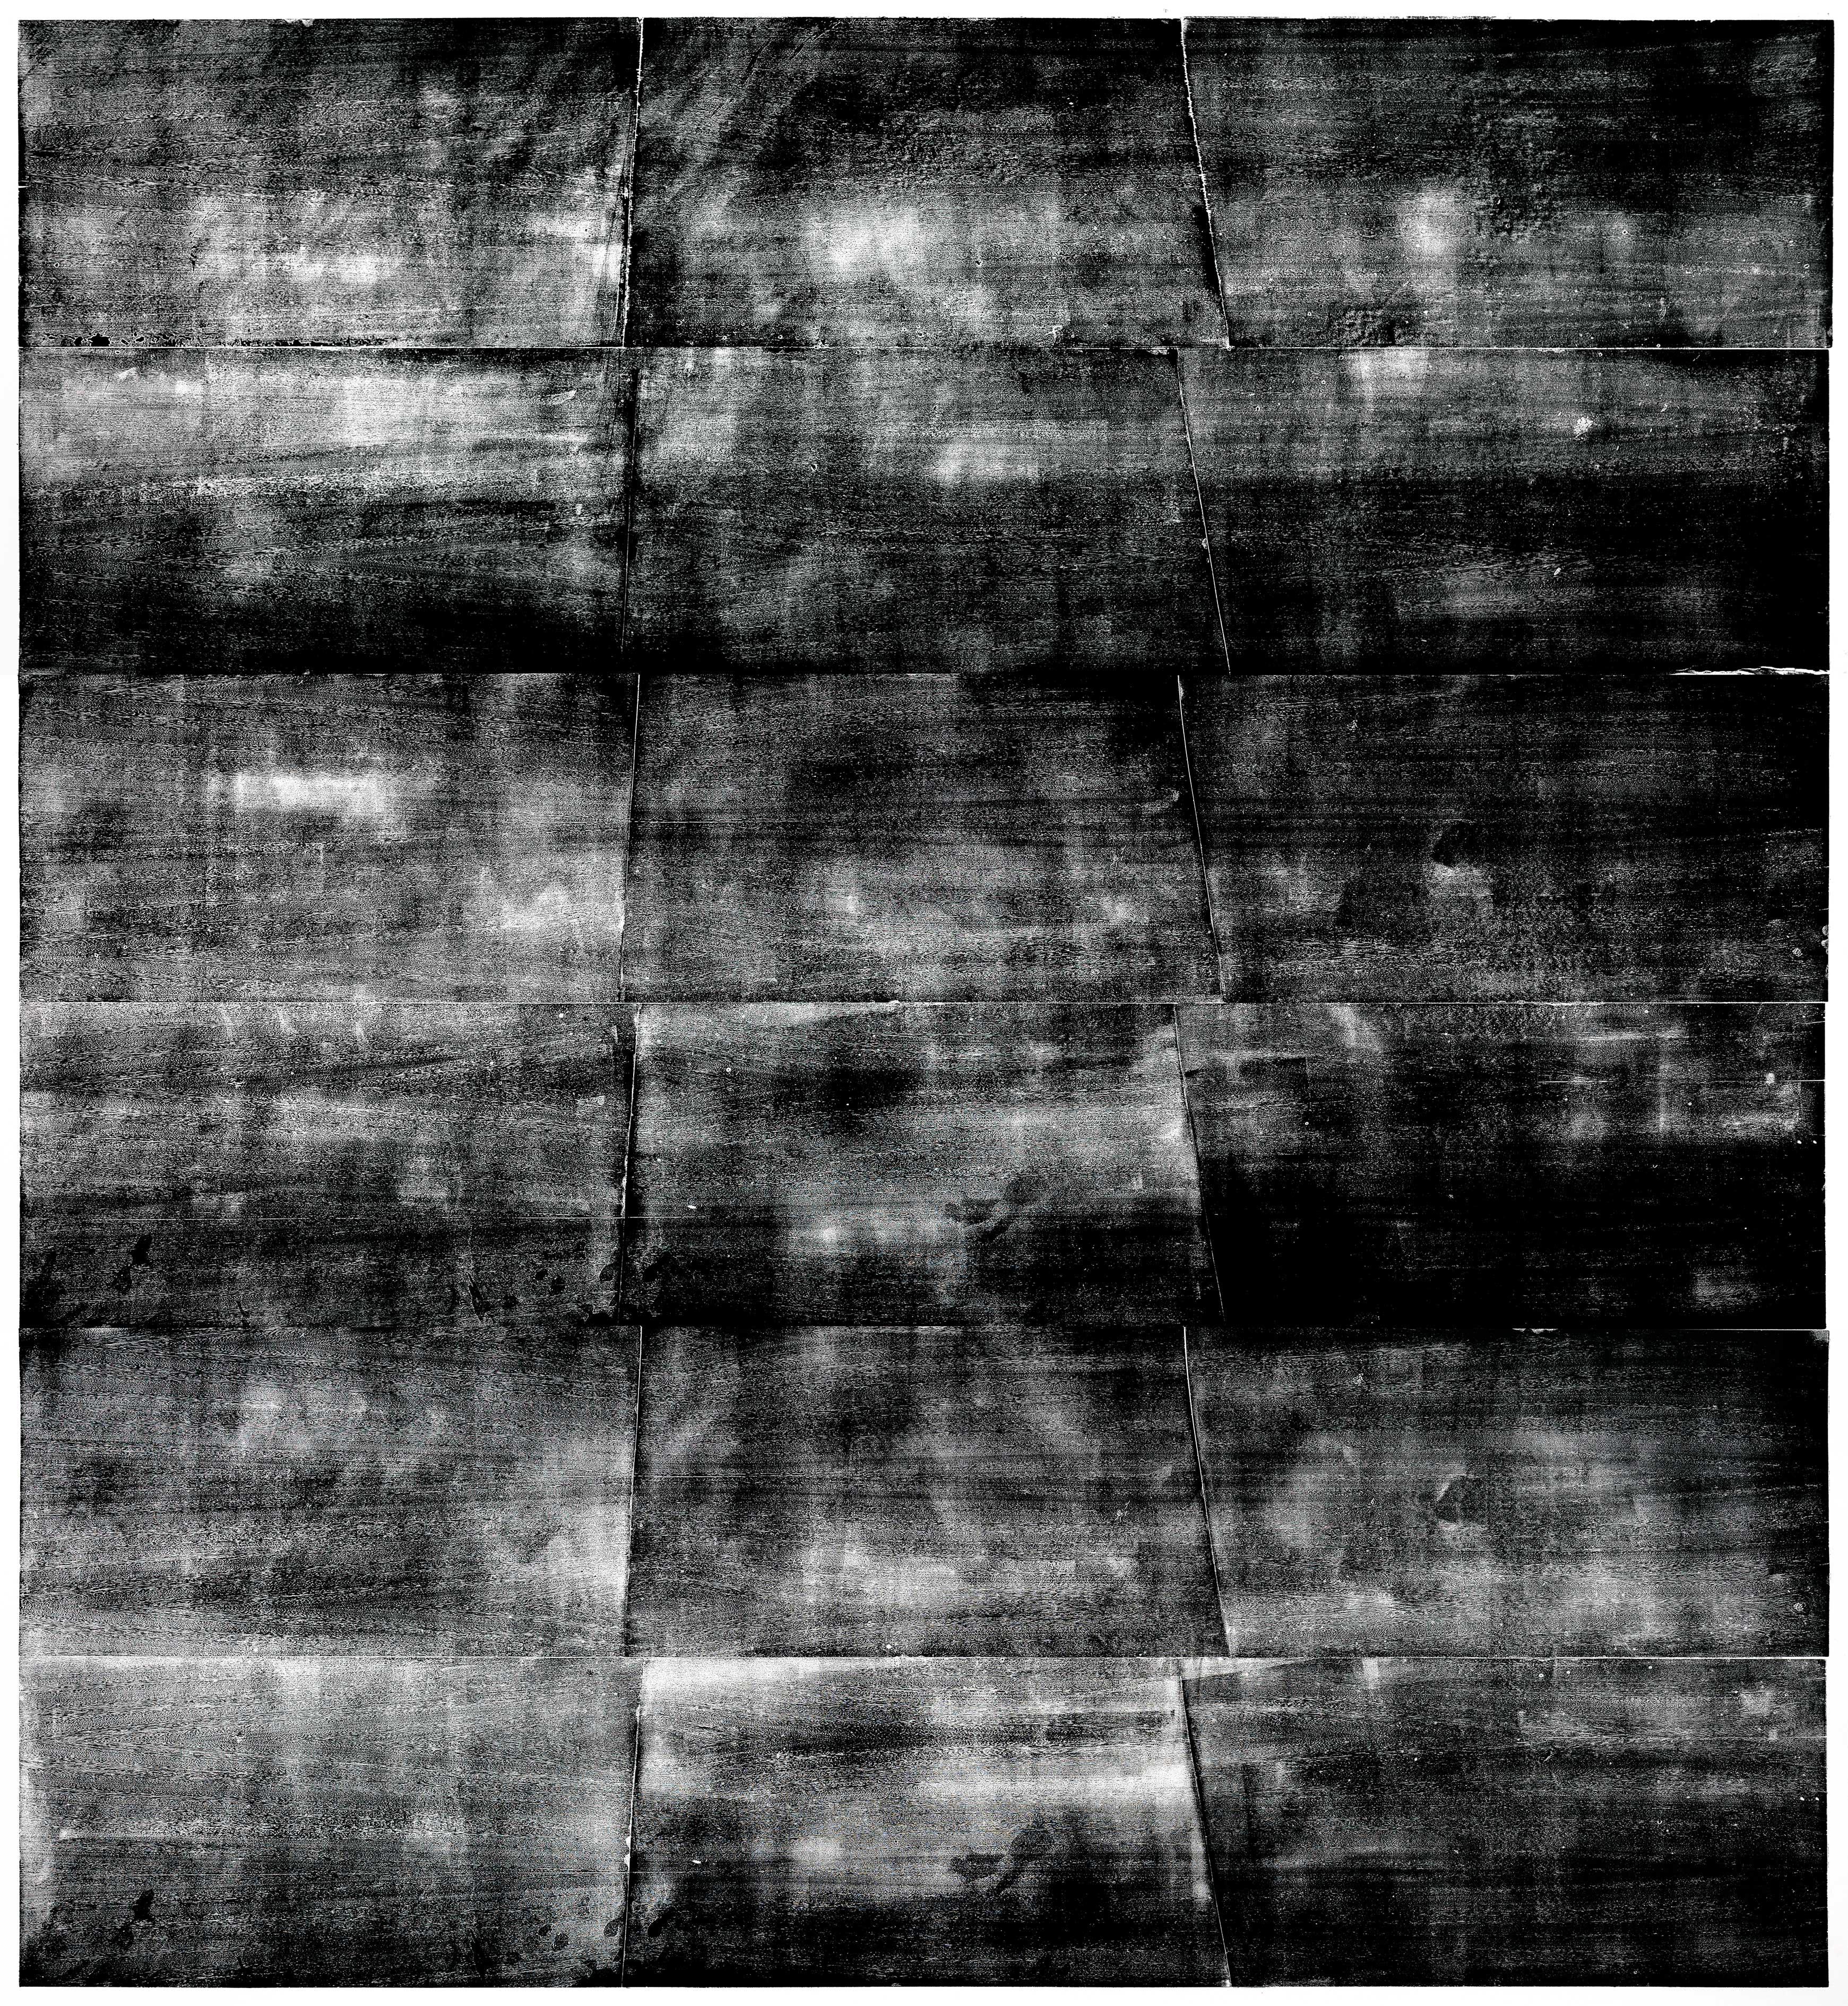 Spreewasser (Dezember), Holzgravur (Mahagoni), 289,3x271,4cm, 2019, Genaro Strobel